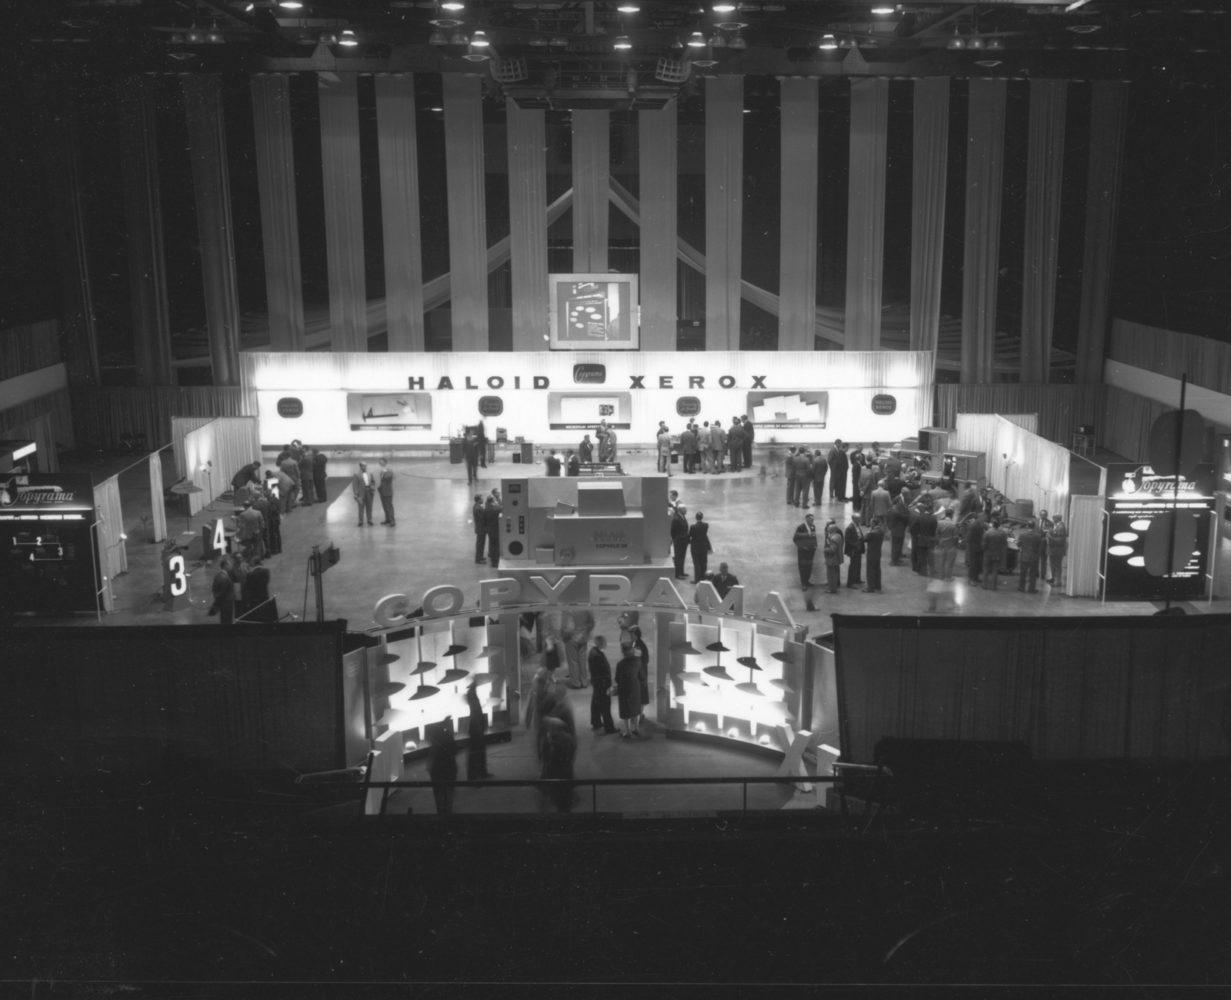 Haloid Xerox trade show in Rochester, New York - photo by Paul Dodd 1976